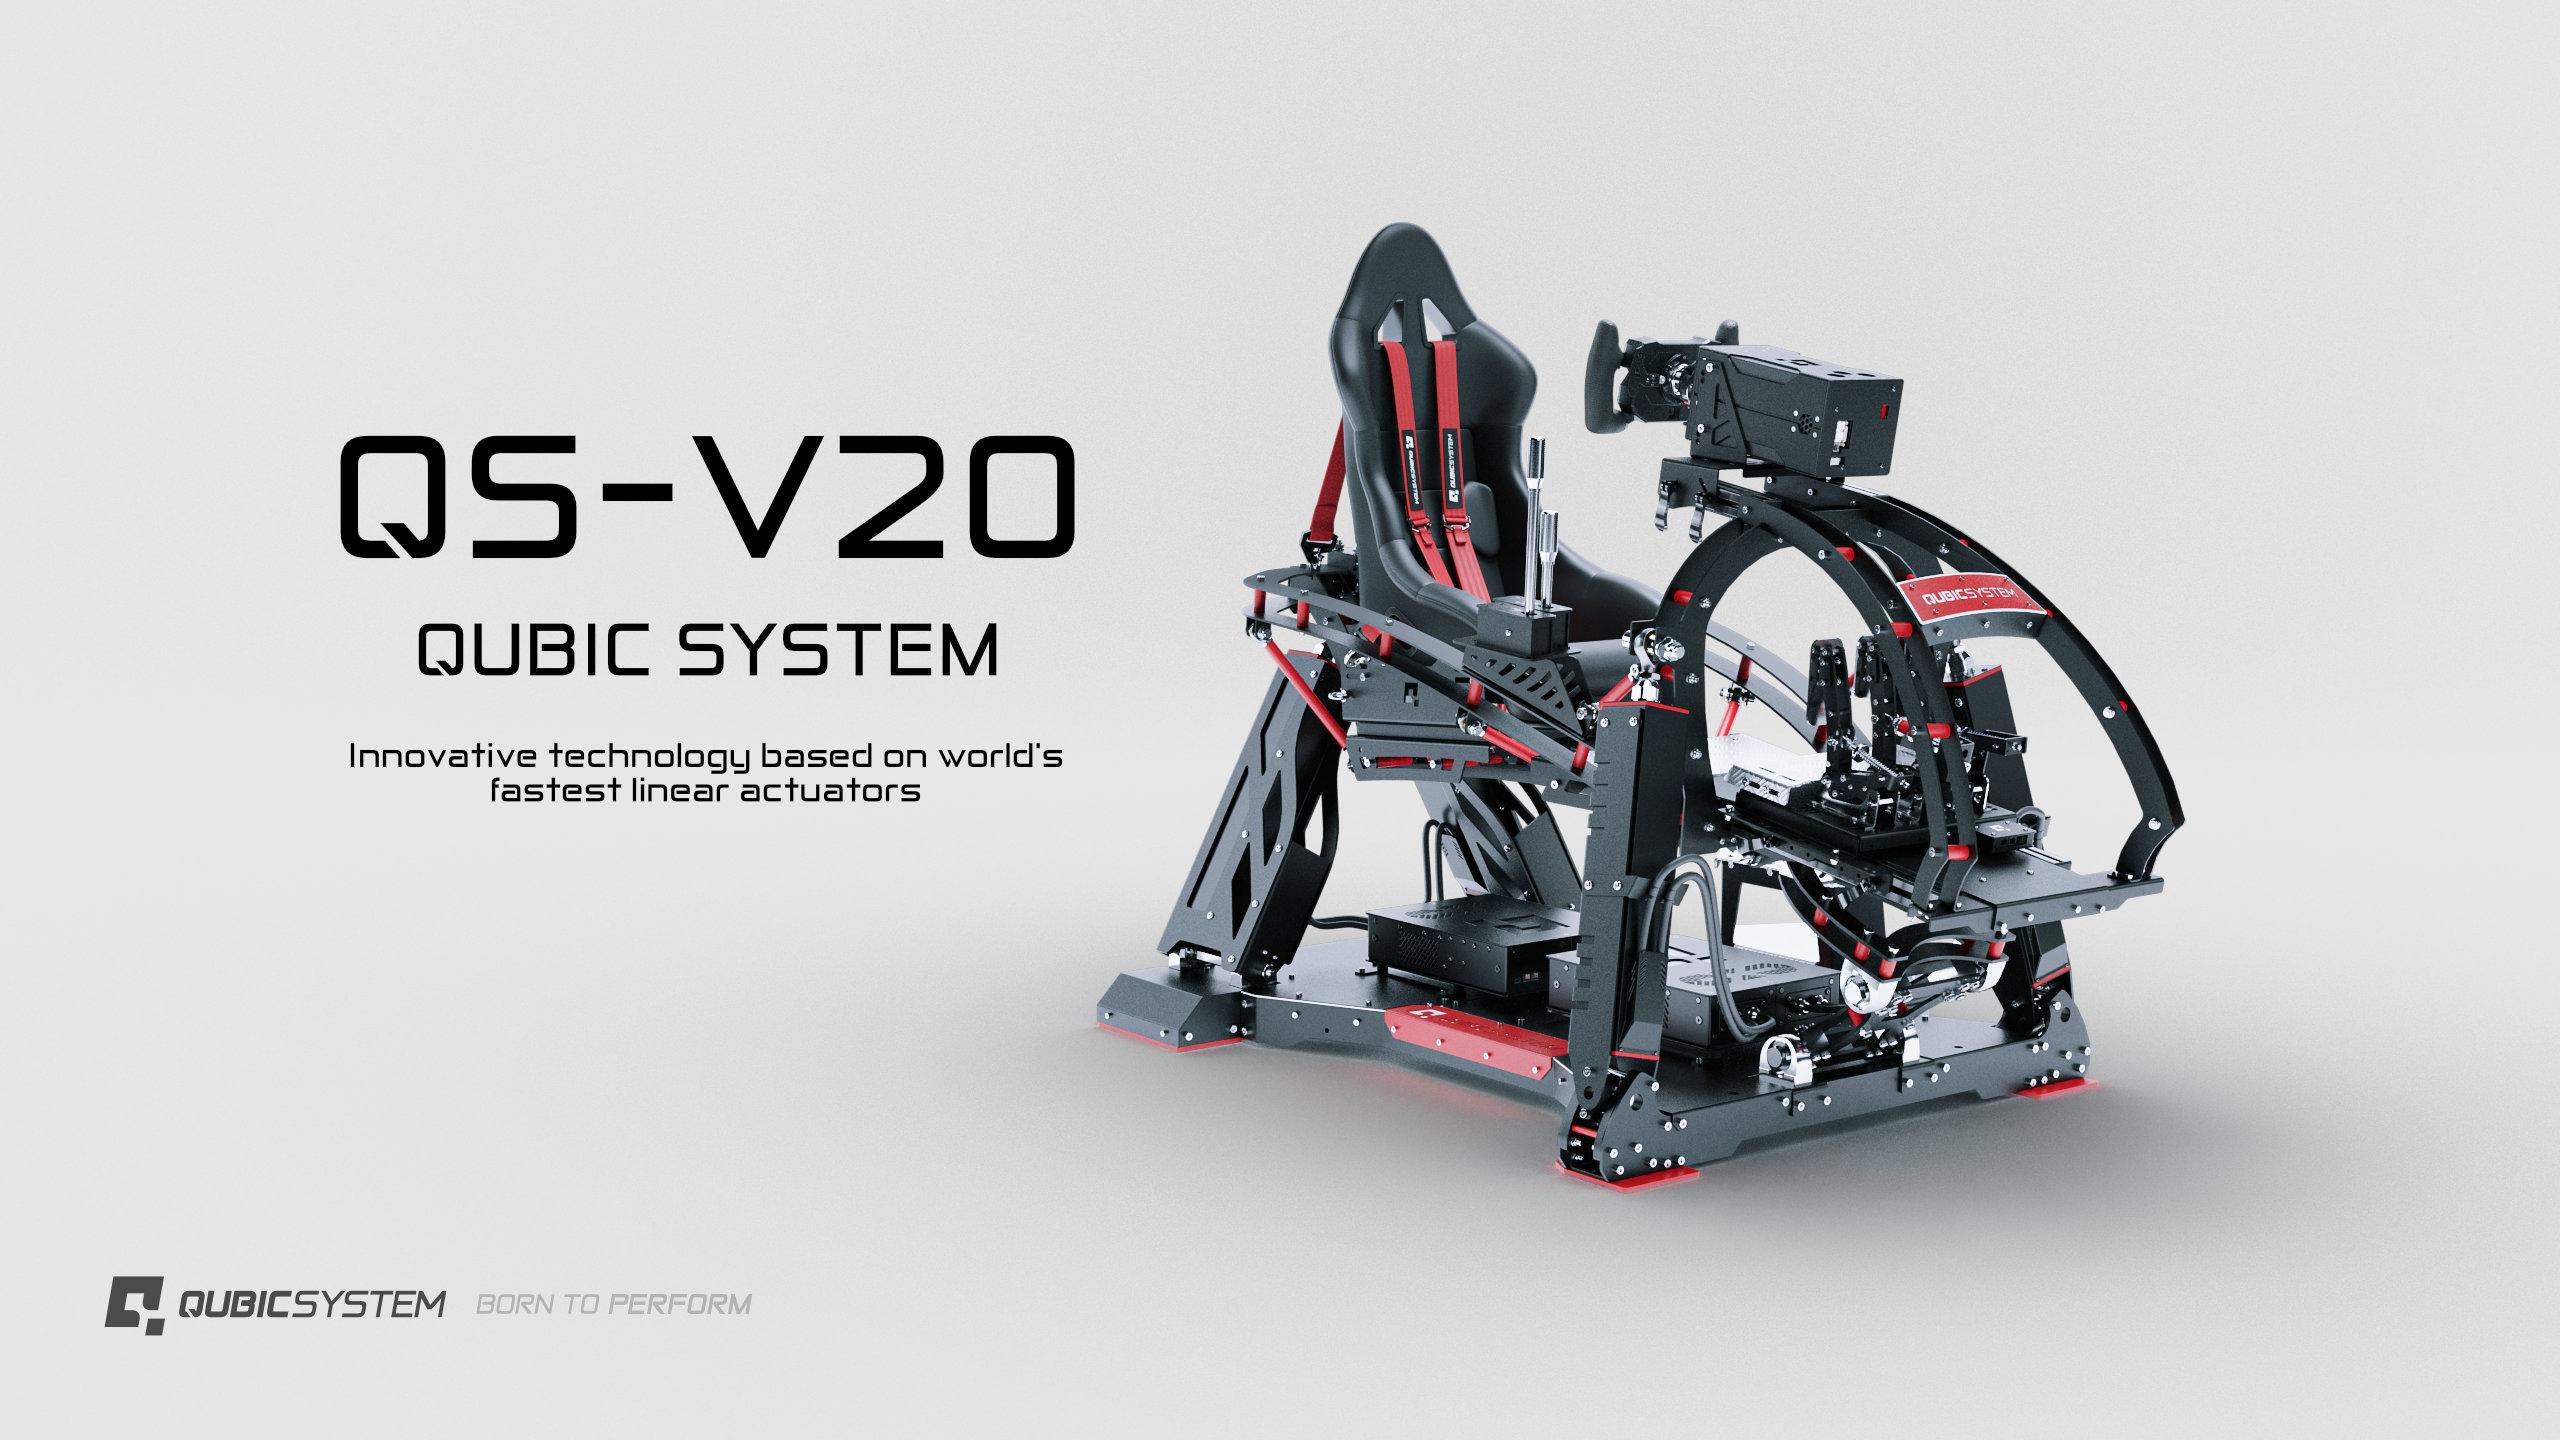 Qubic System QS-V20